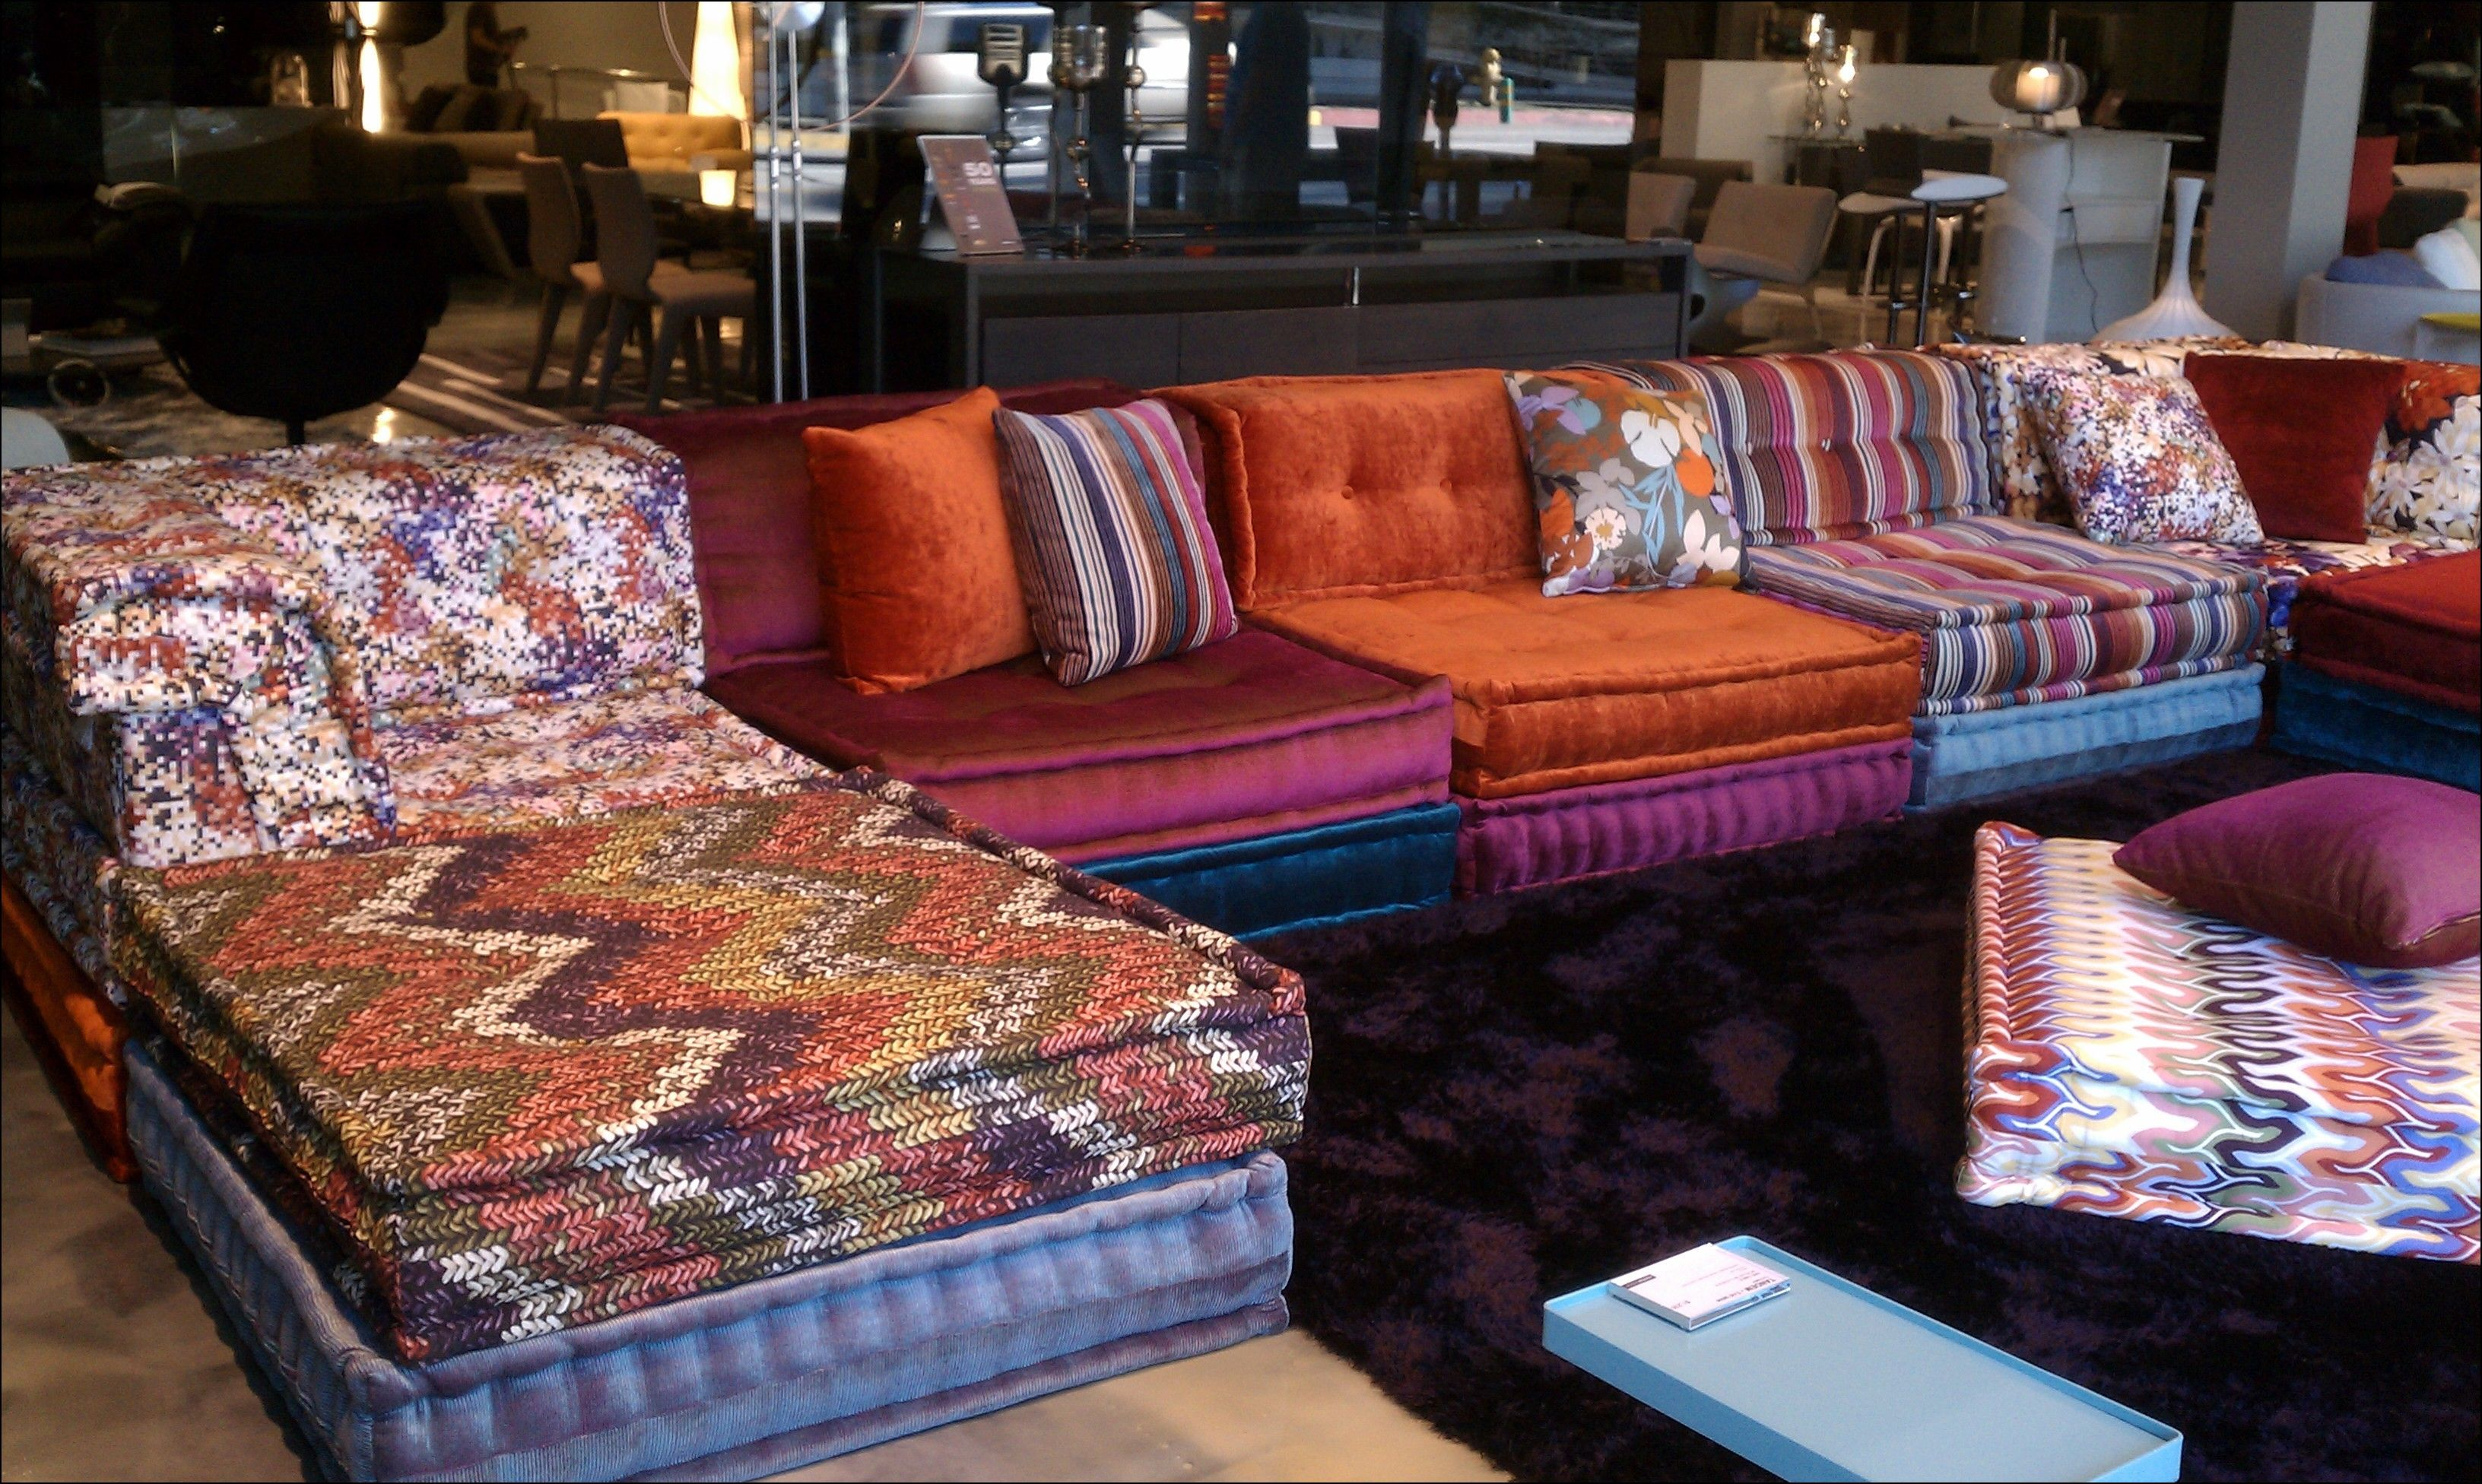 Miraculous Moroccan Couch For Sale Home Ideas Floor Couch Sofa Customarchery Wood Chair Design Ideas Customarcherynet